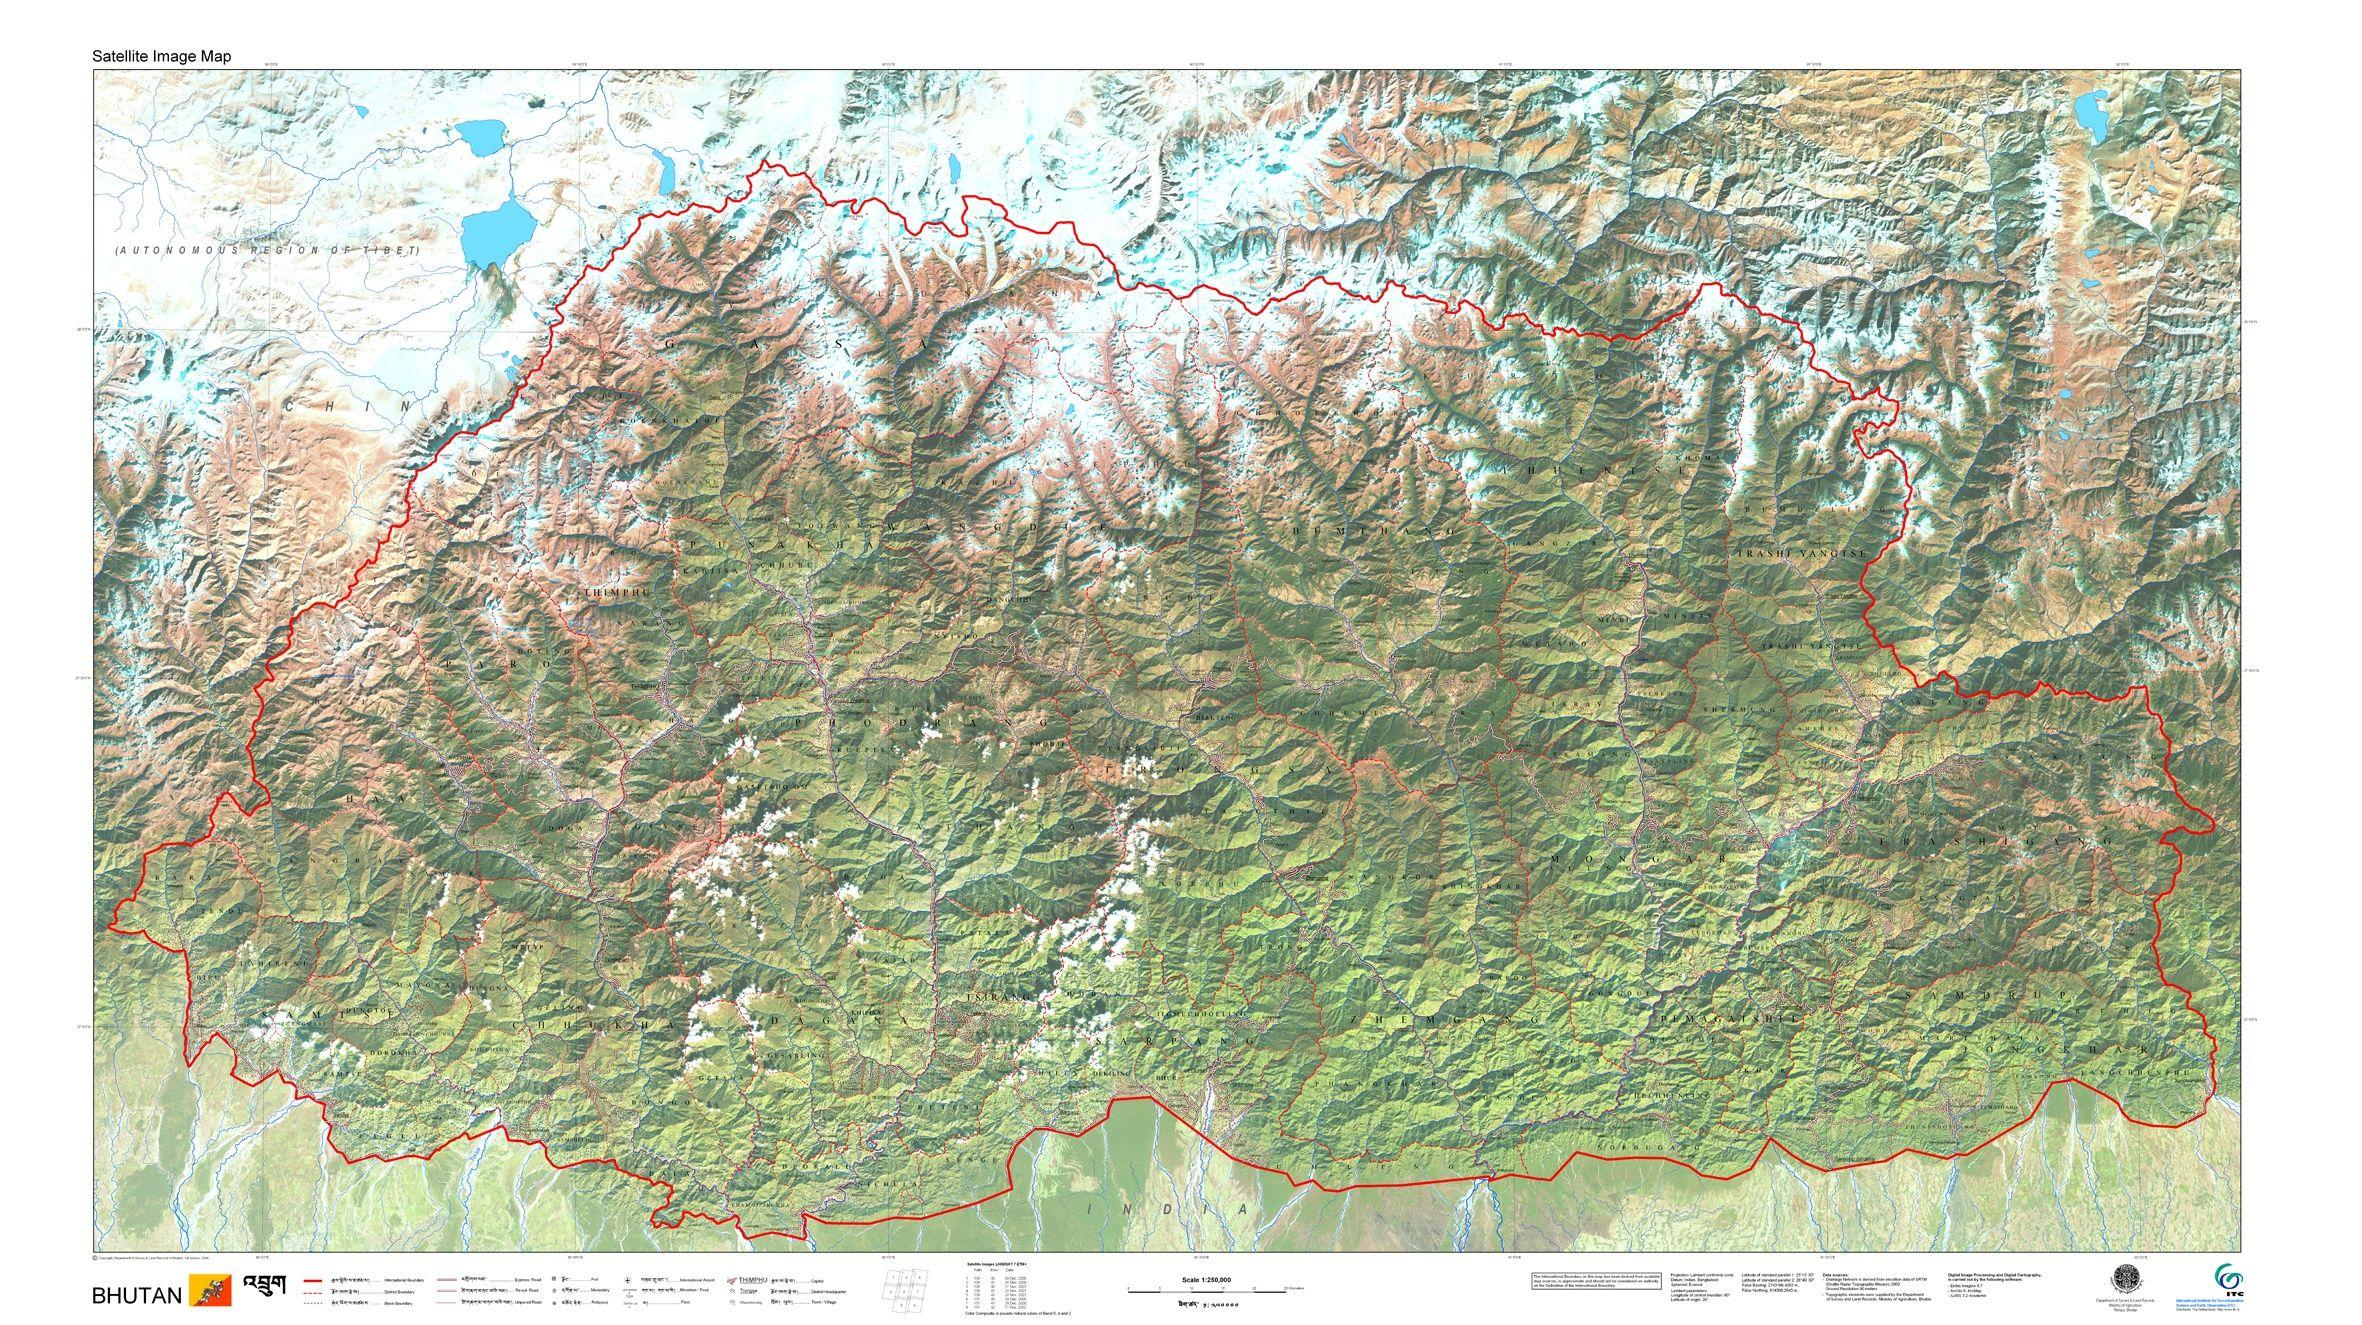 Satellite image map of Bhutan, by Geomapa #map #bhutan | Cartography ...